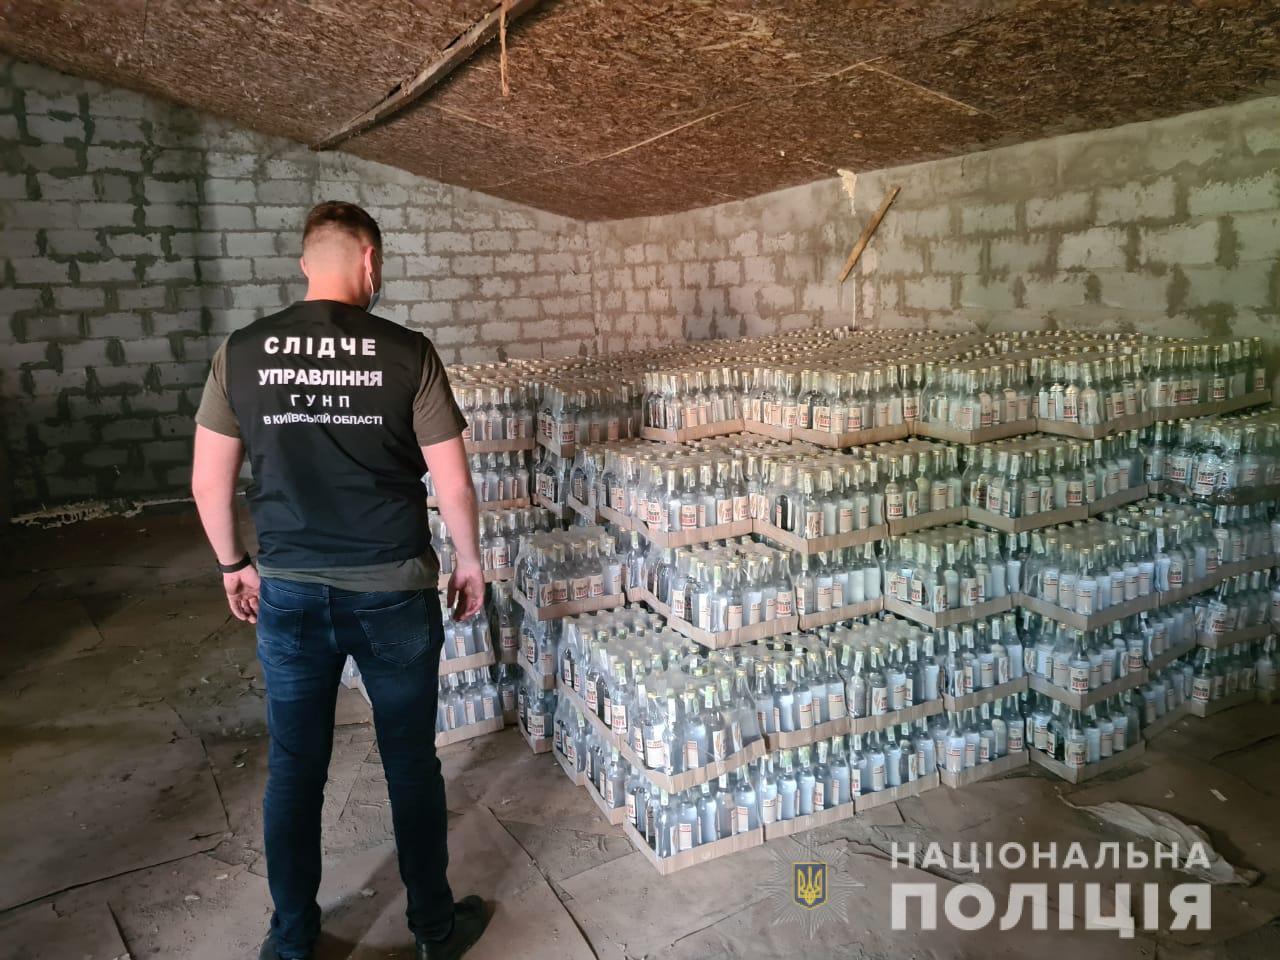 В Киевской области полицейские изъяли 20 тонн фальсификата на сумму почти в 10 миллионов гривен